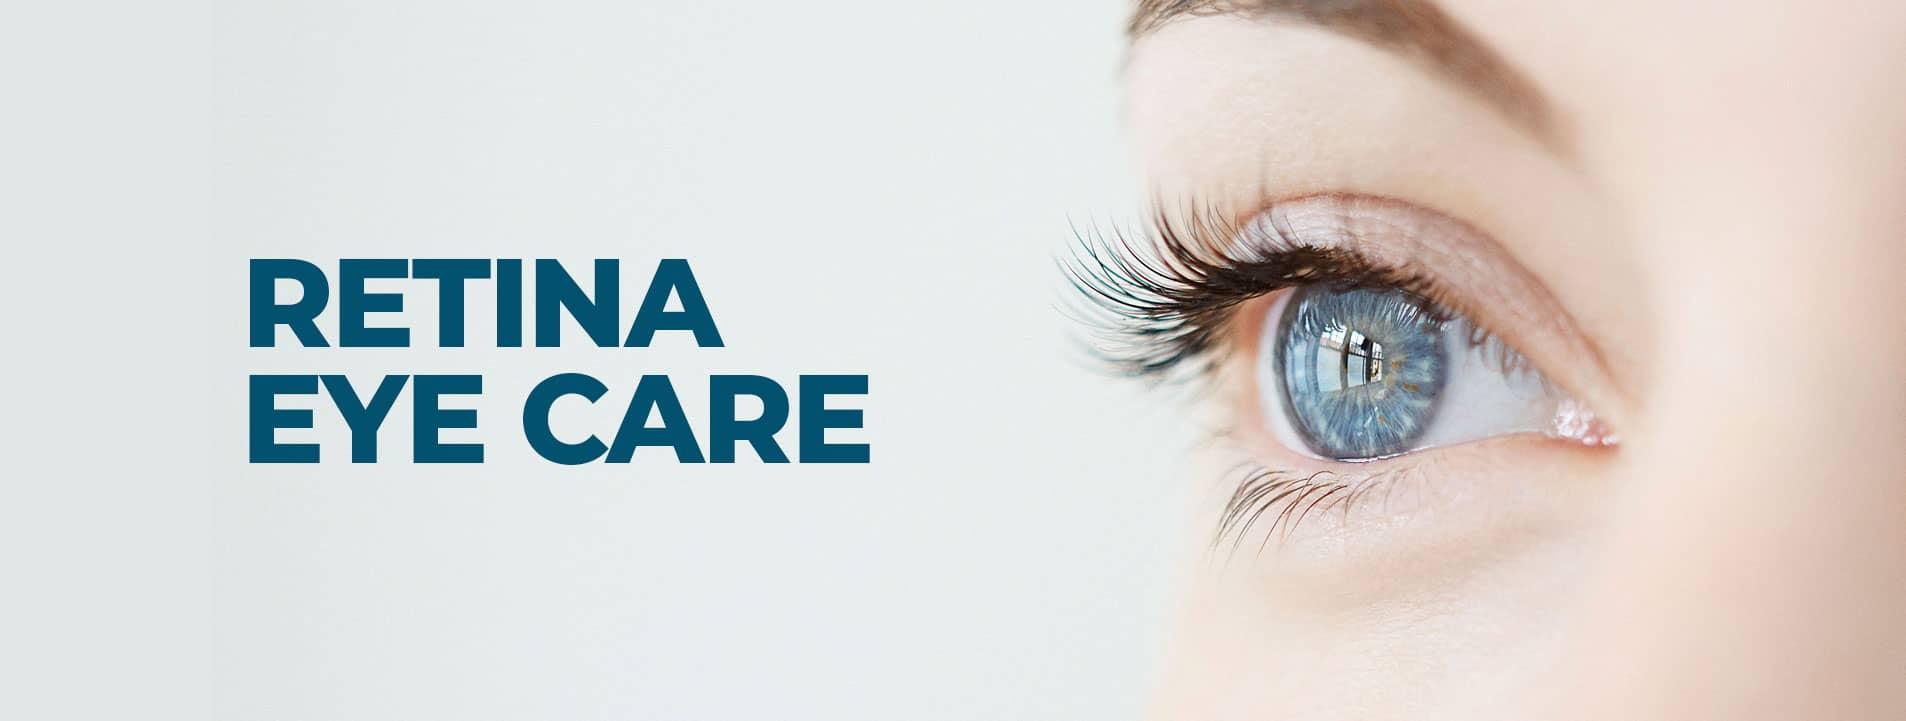 Retina Eye Care